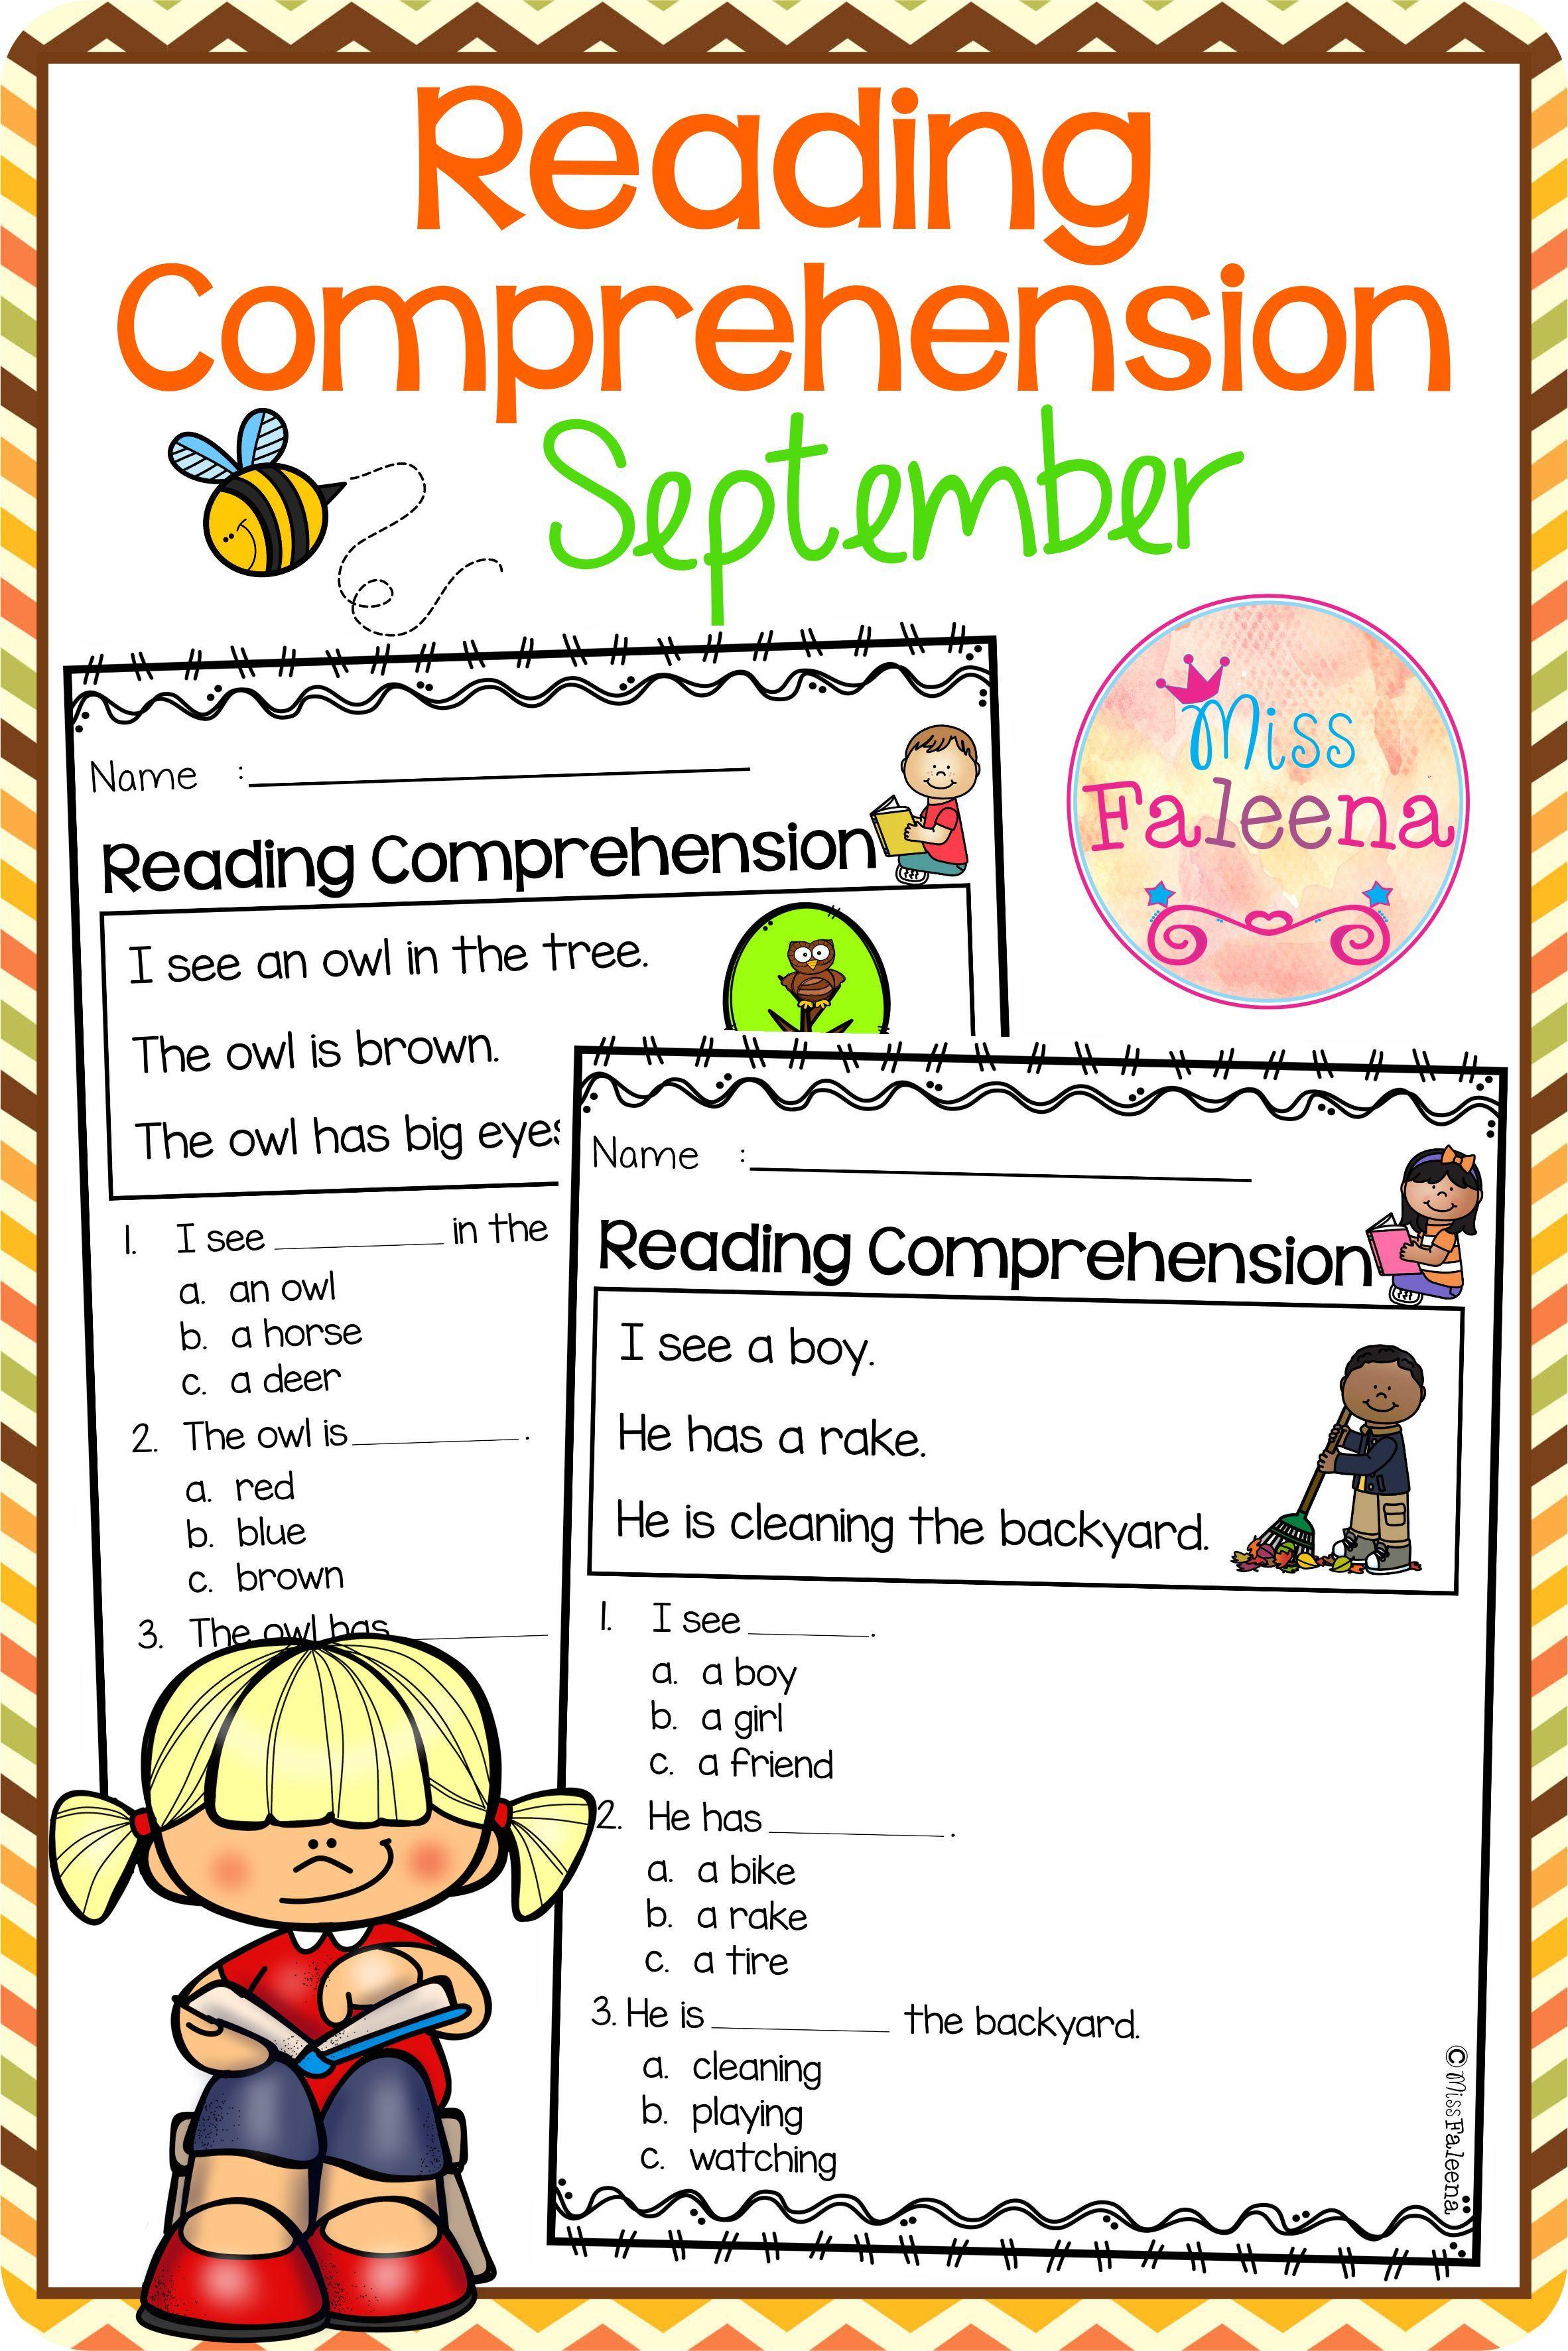 September Reading Comprehension In